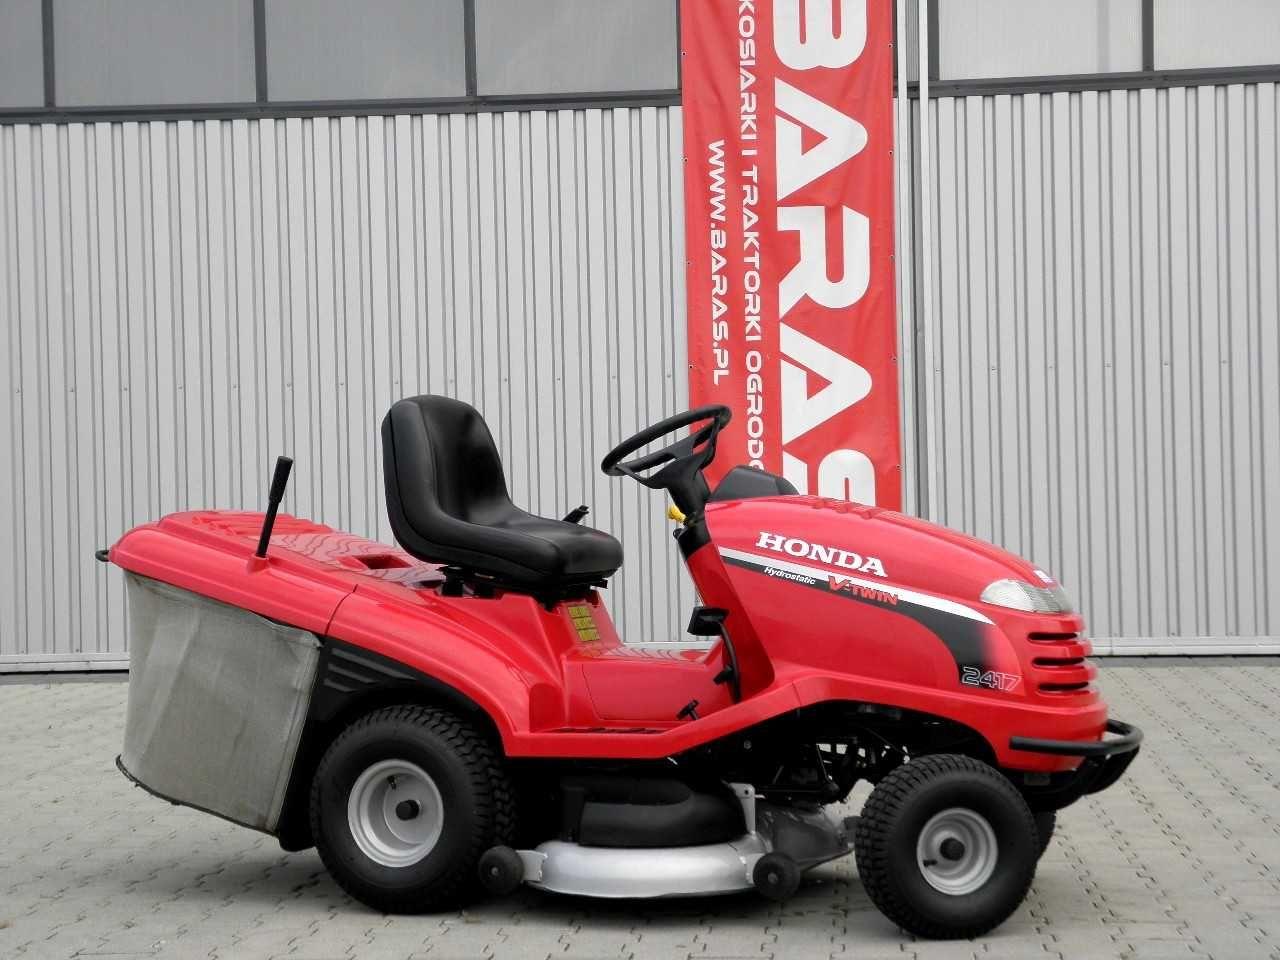 Traktorek kosiarka HONDA 2417 (071005) - Baras